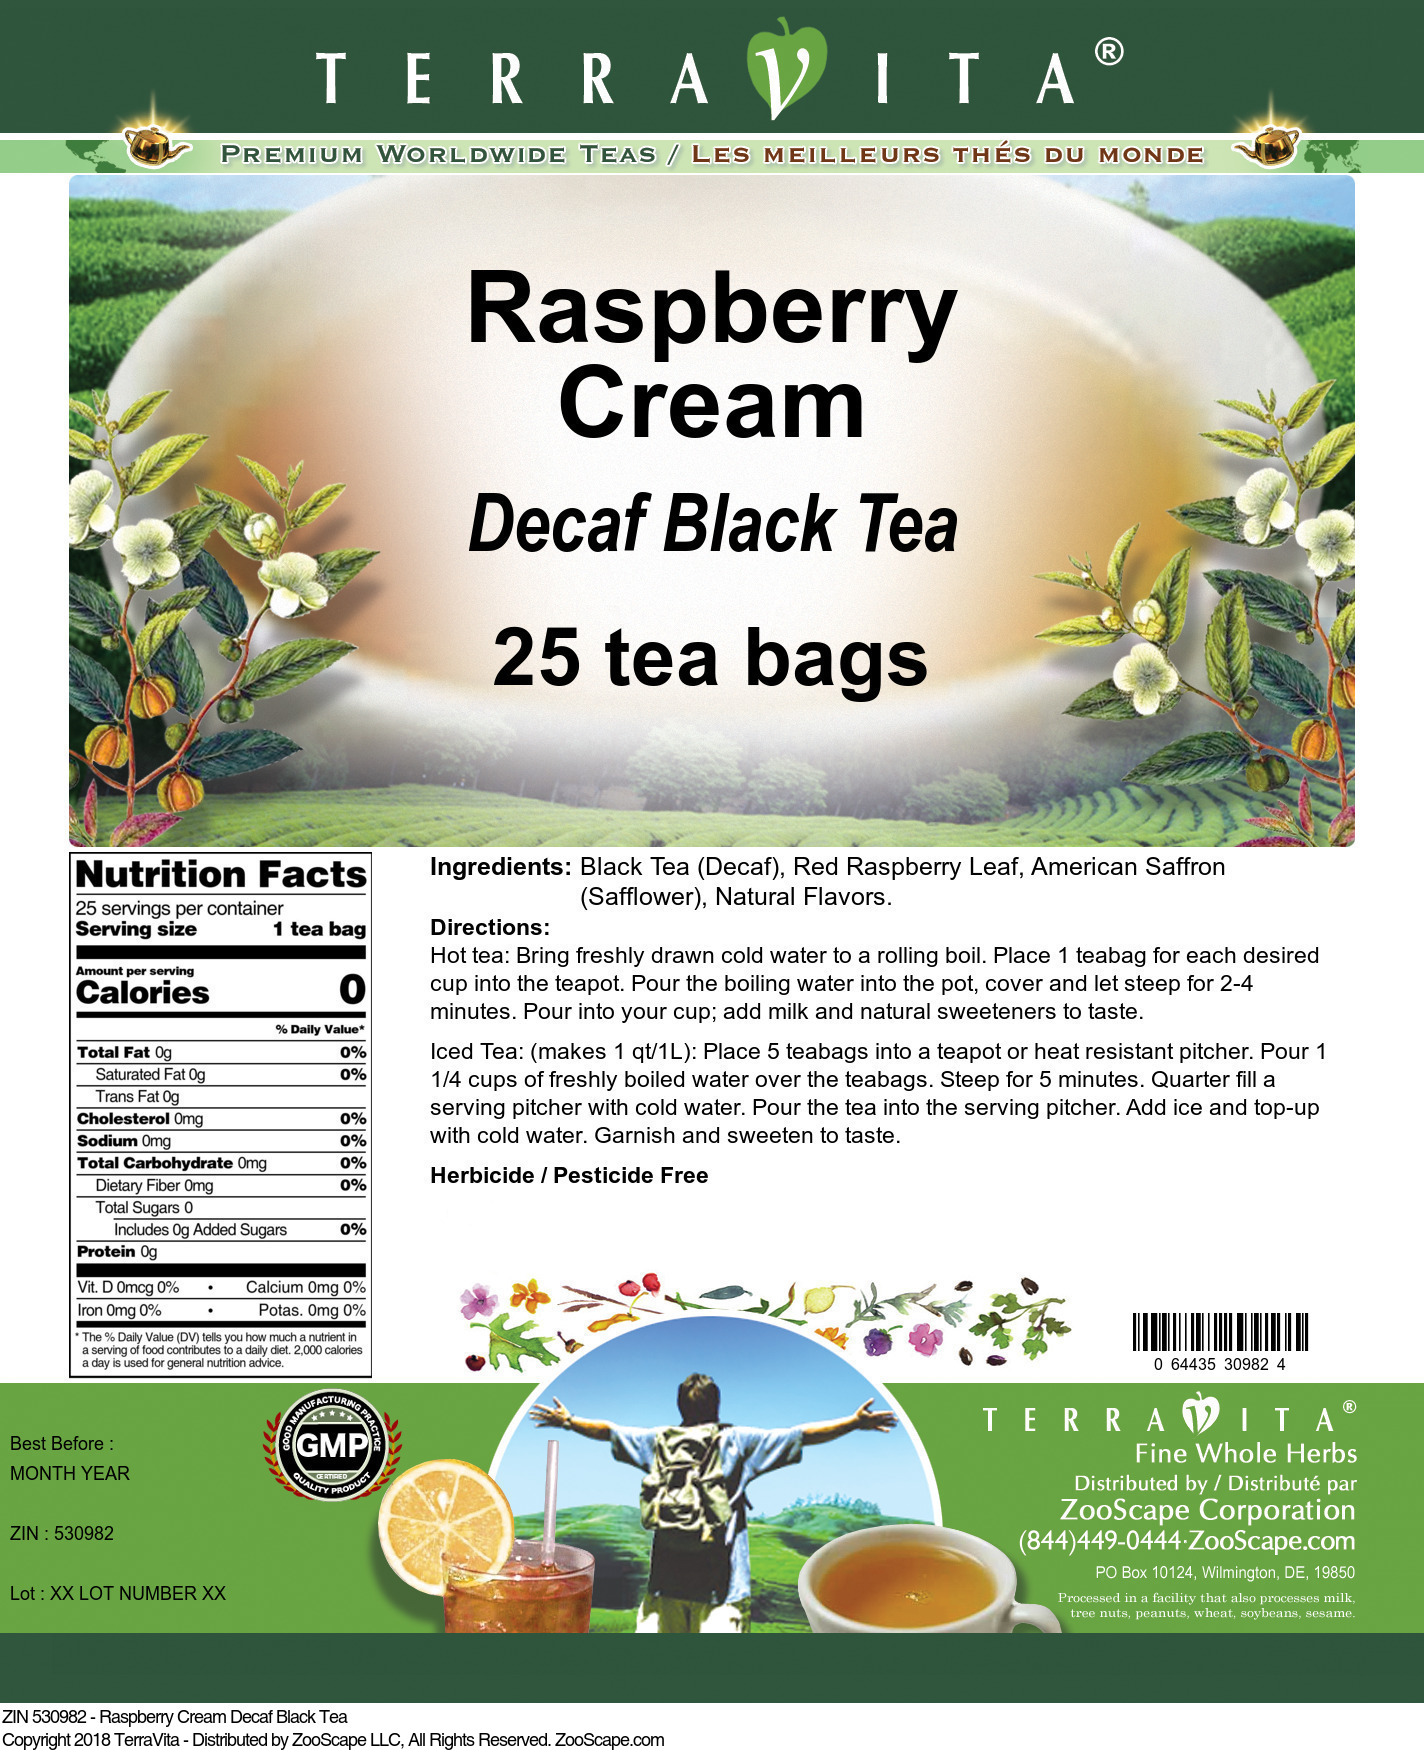 Raspberry Cream Decaf Black Tea